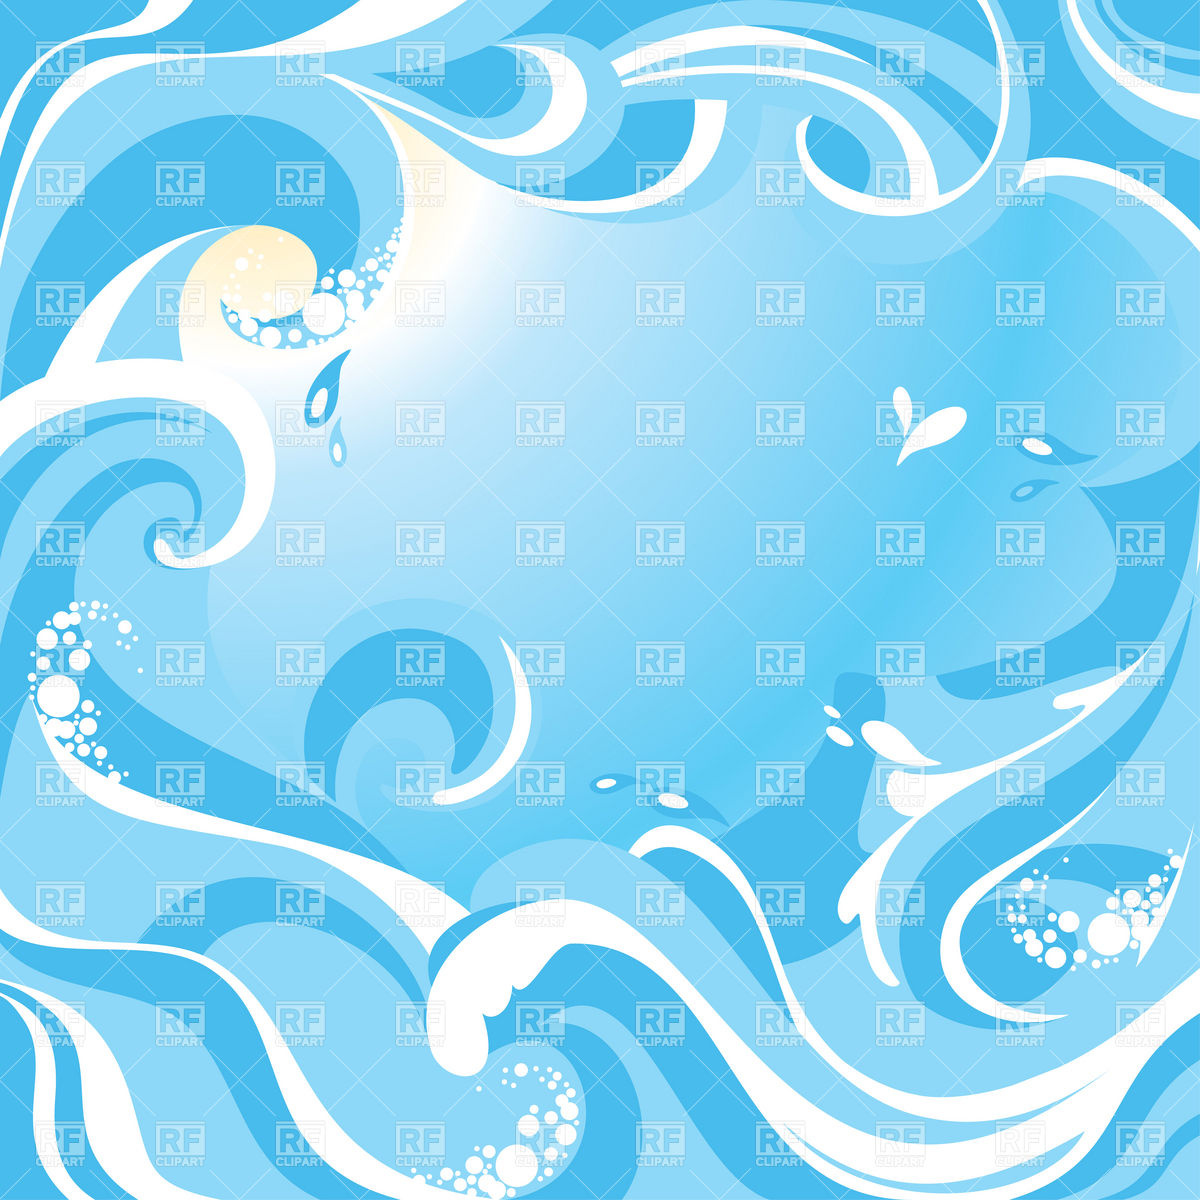 Clipart ocean royalty free. Download best